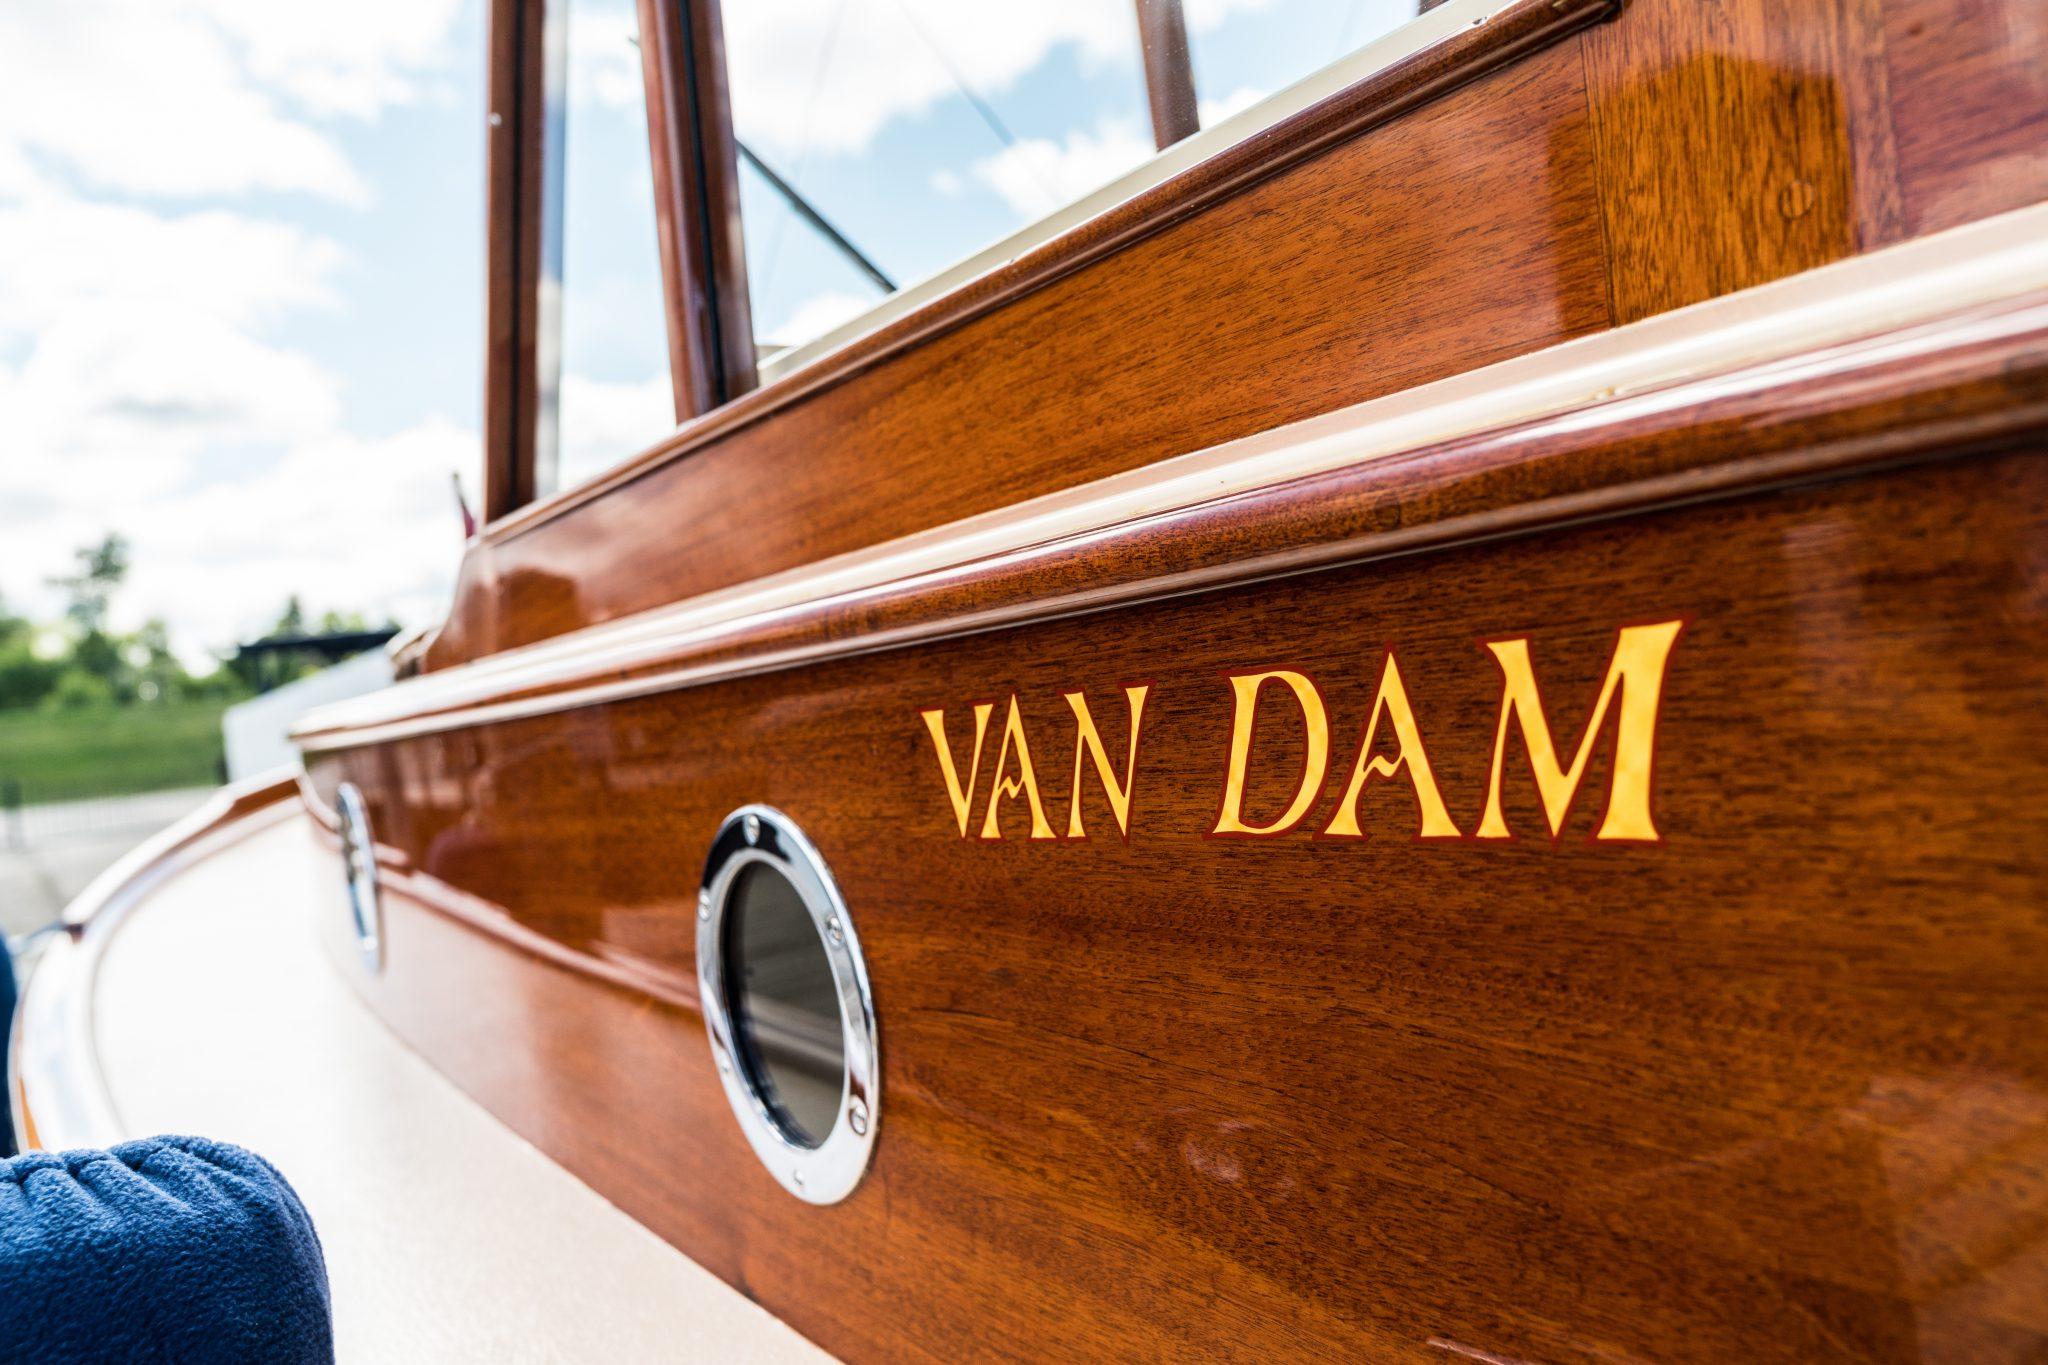 Stunning Van Dam craftsmanship